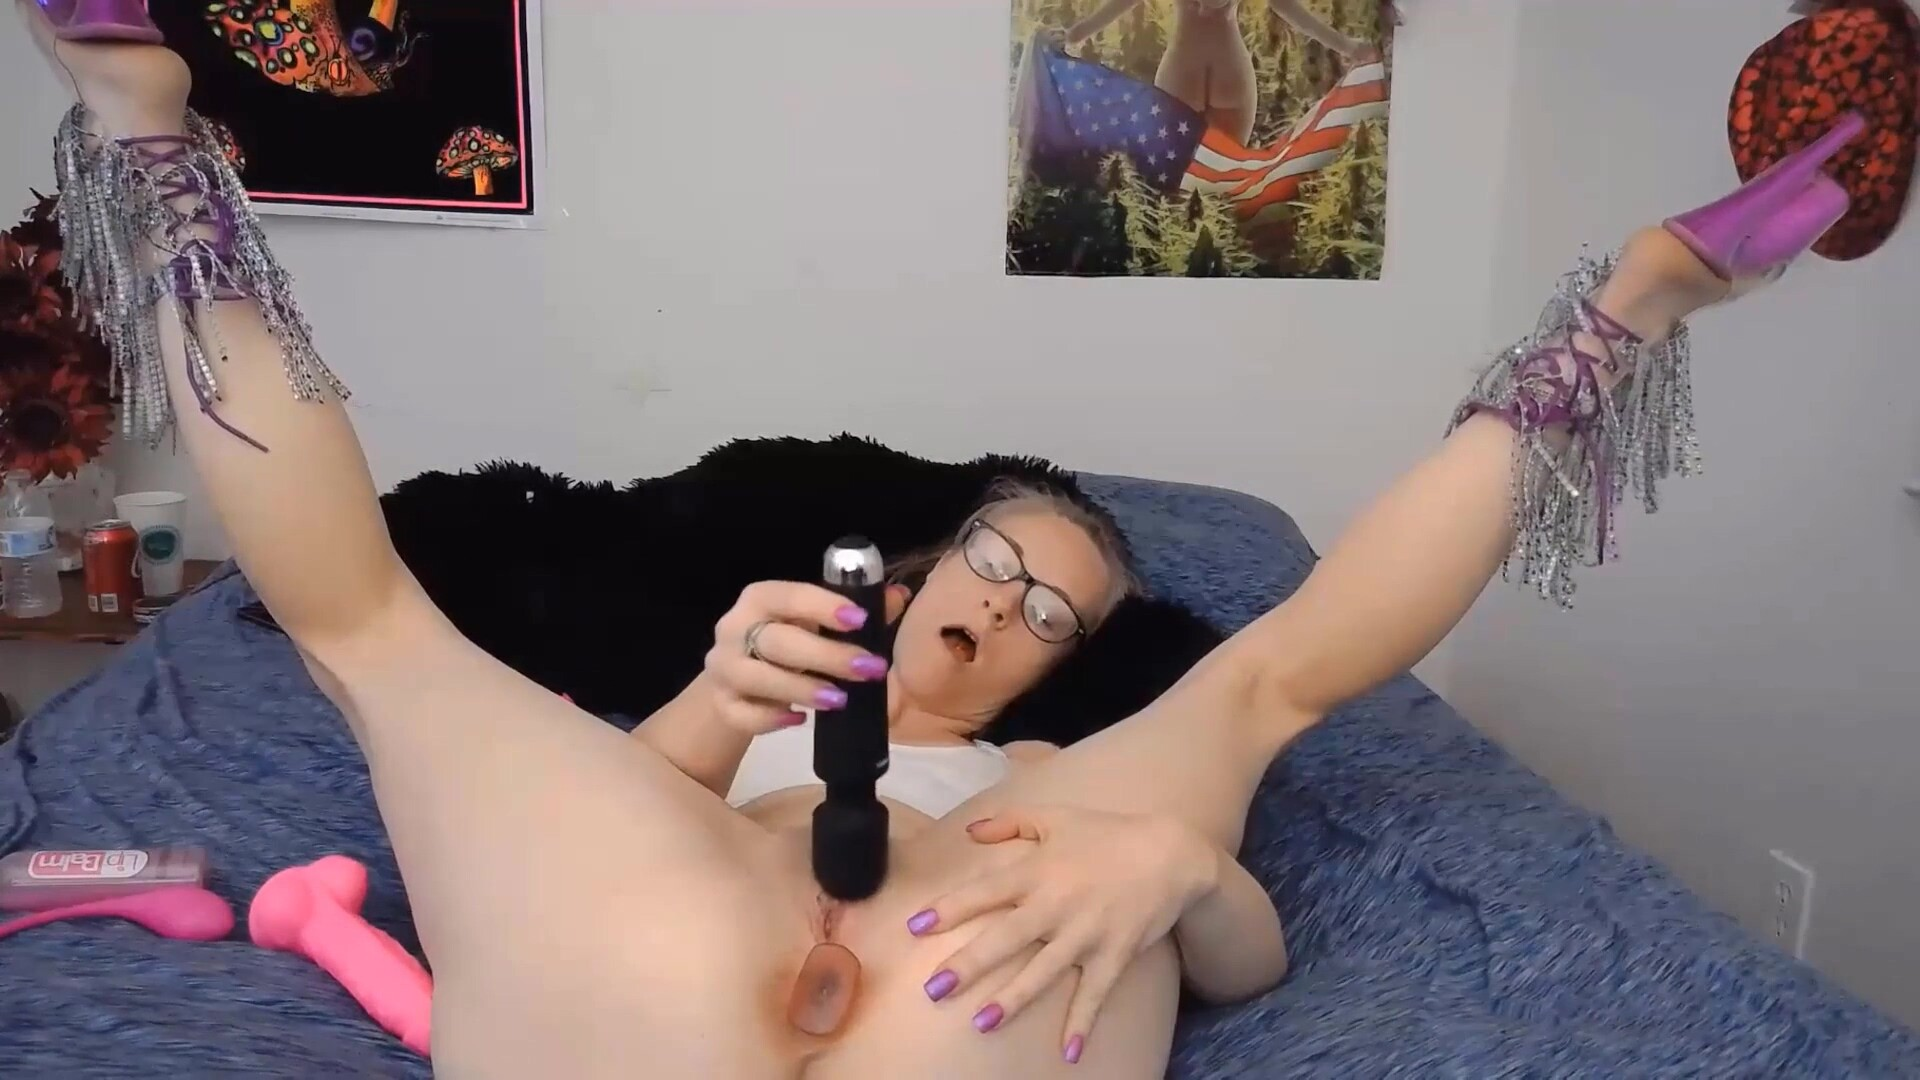 Video 1531266504: tiny ass hole, amateur blowjob small tits, anal toying blowjob, tight wet pussy, tight pussy play, red head anal, love masturbating, camera masturbation, sexy